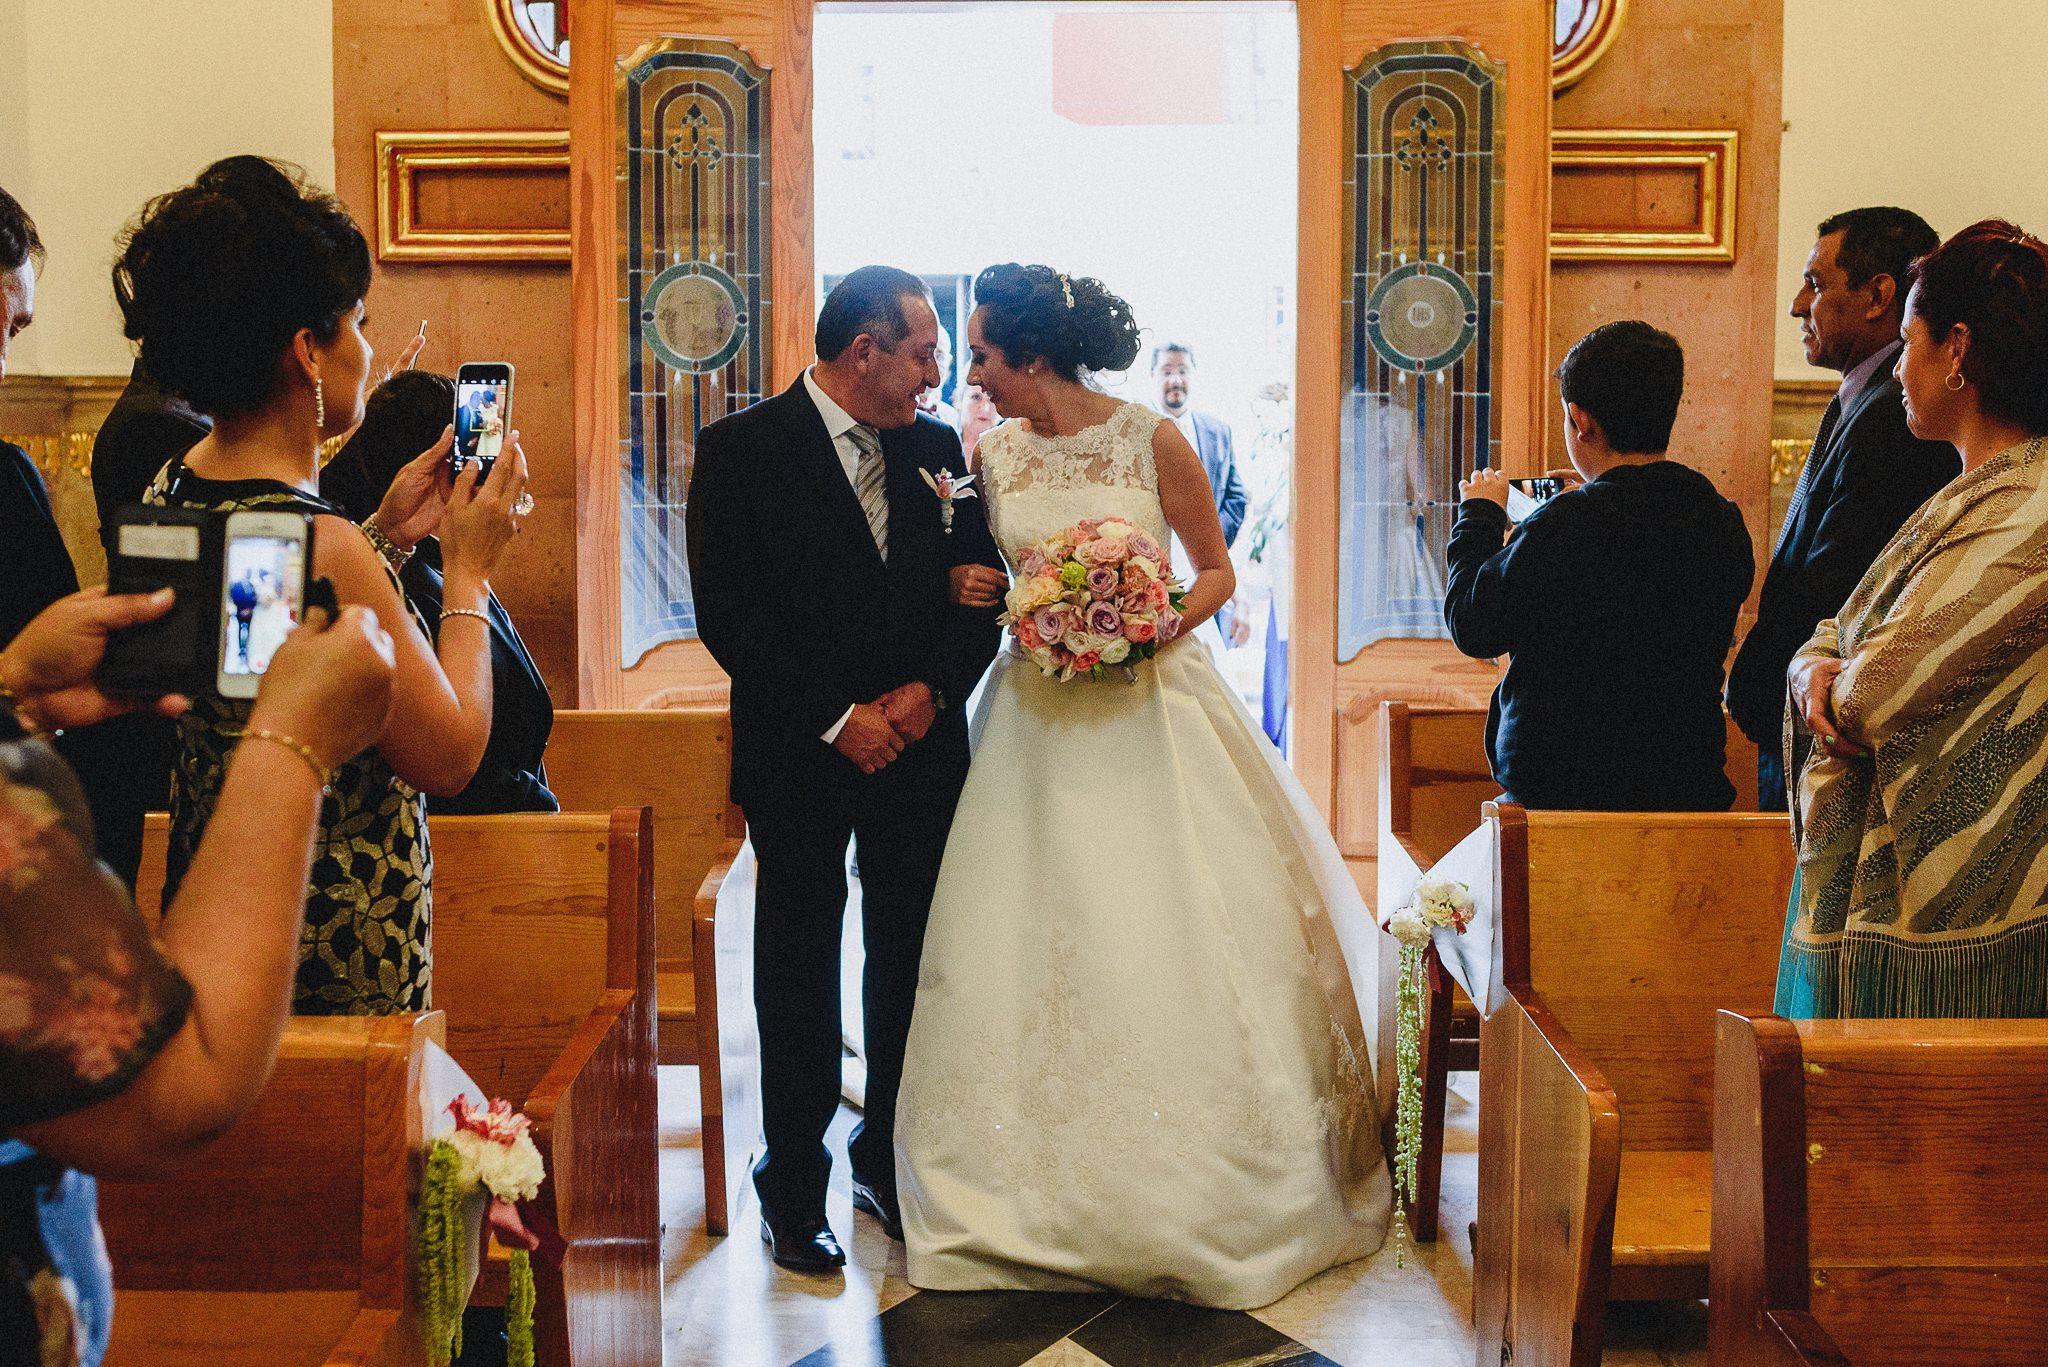 Wedding-Boda-Tulancingo-Hidalgo-Salon-Essenzia-Luis-Houdin-19-film